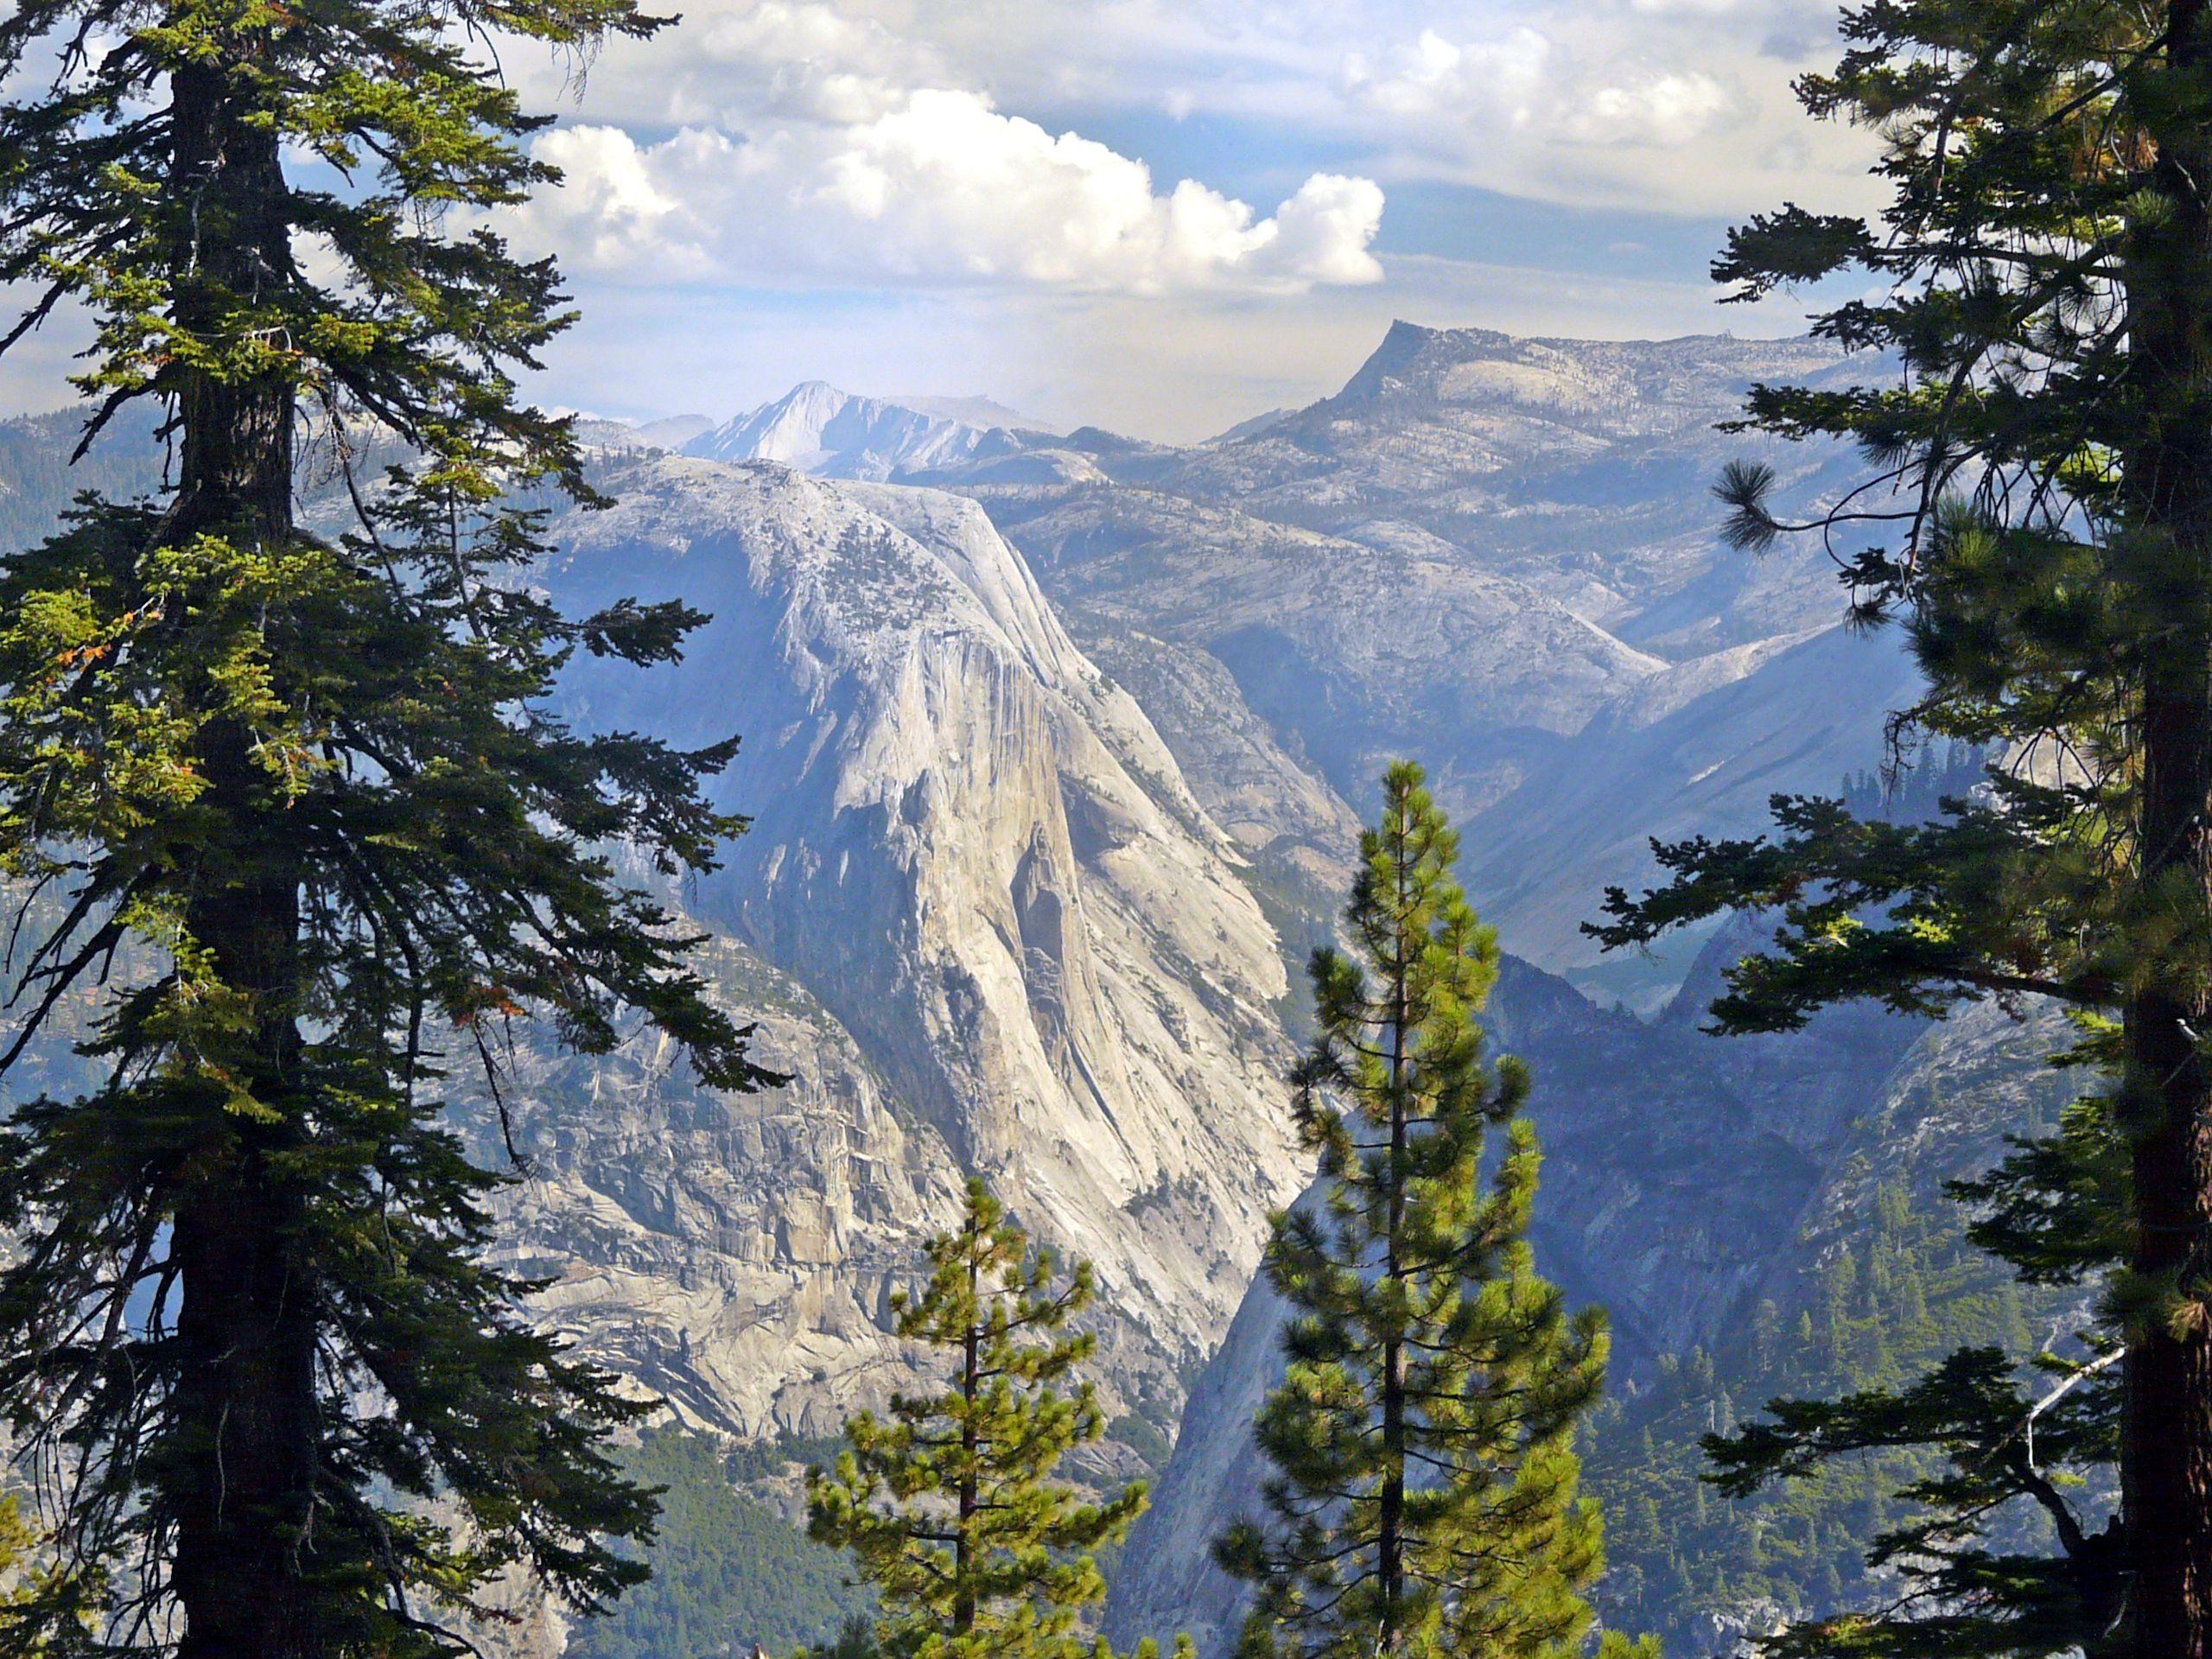 Pin by Luis Ariel on Yosemite | Yosemite california